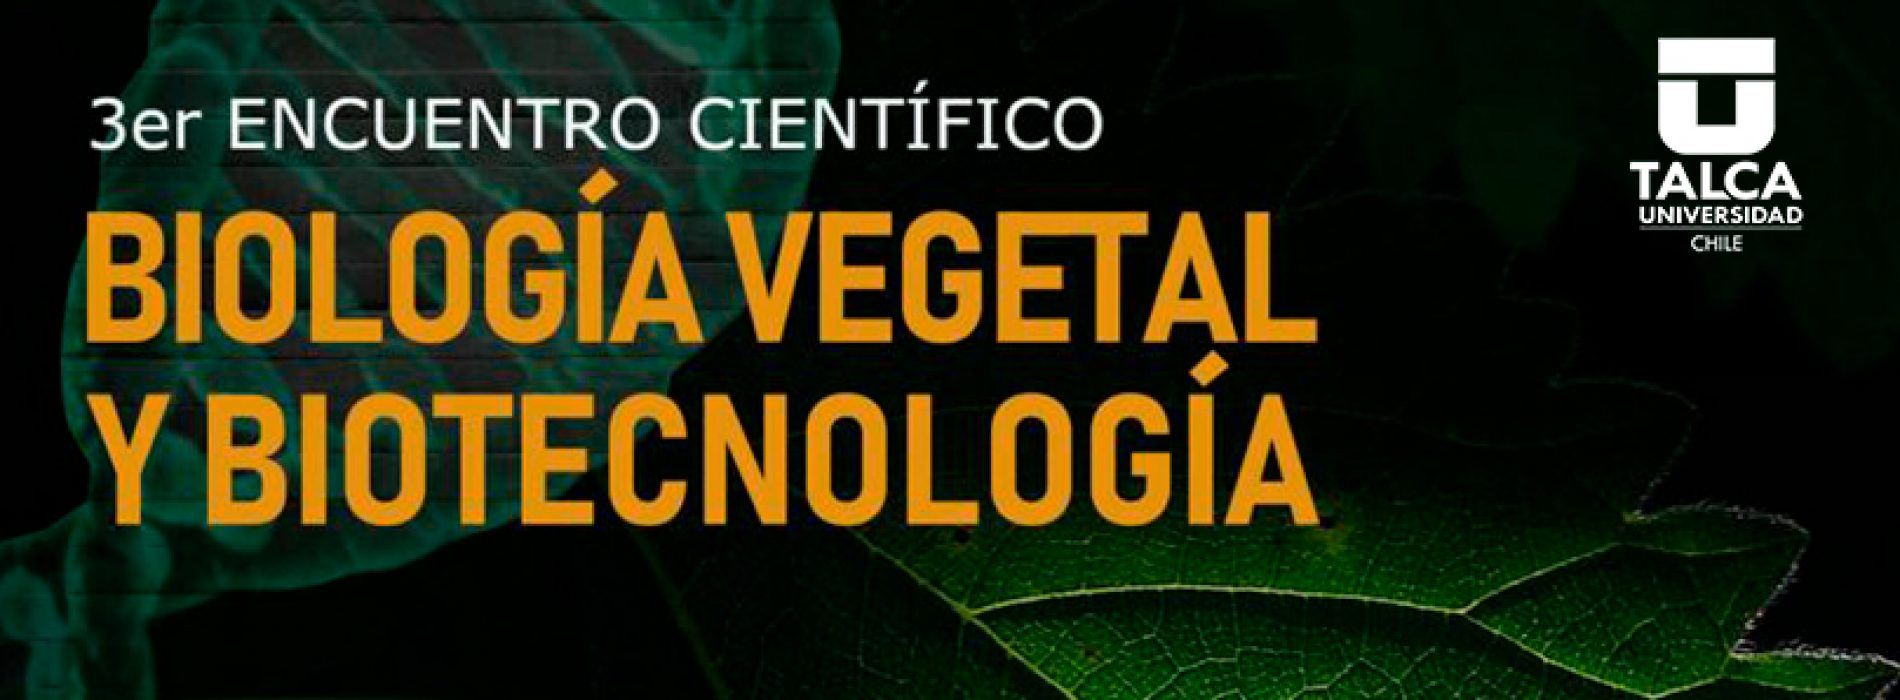 3rd scientific meeting plant biology